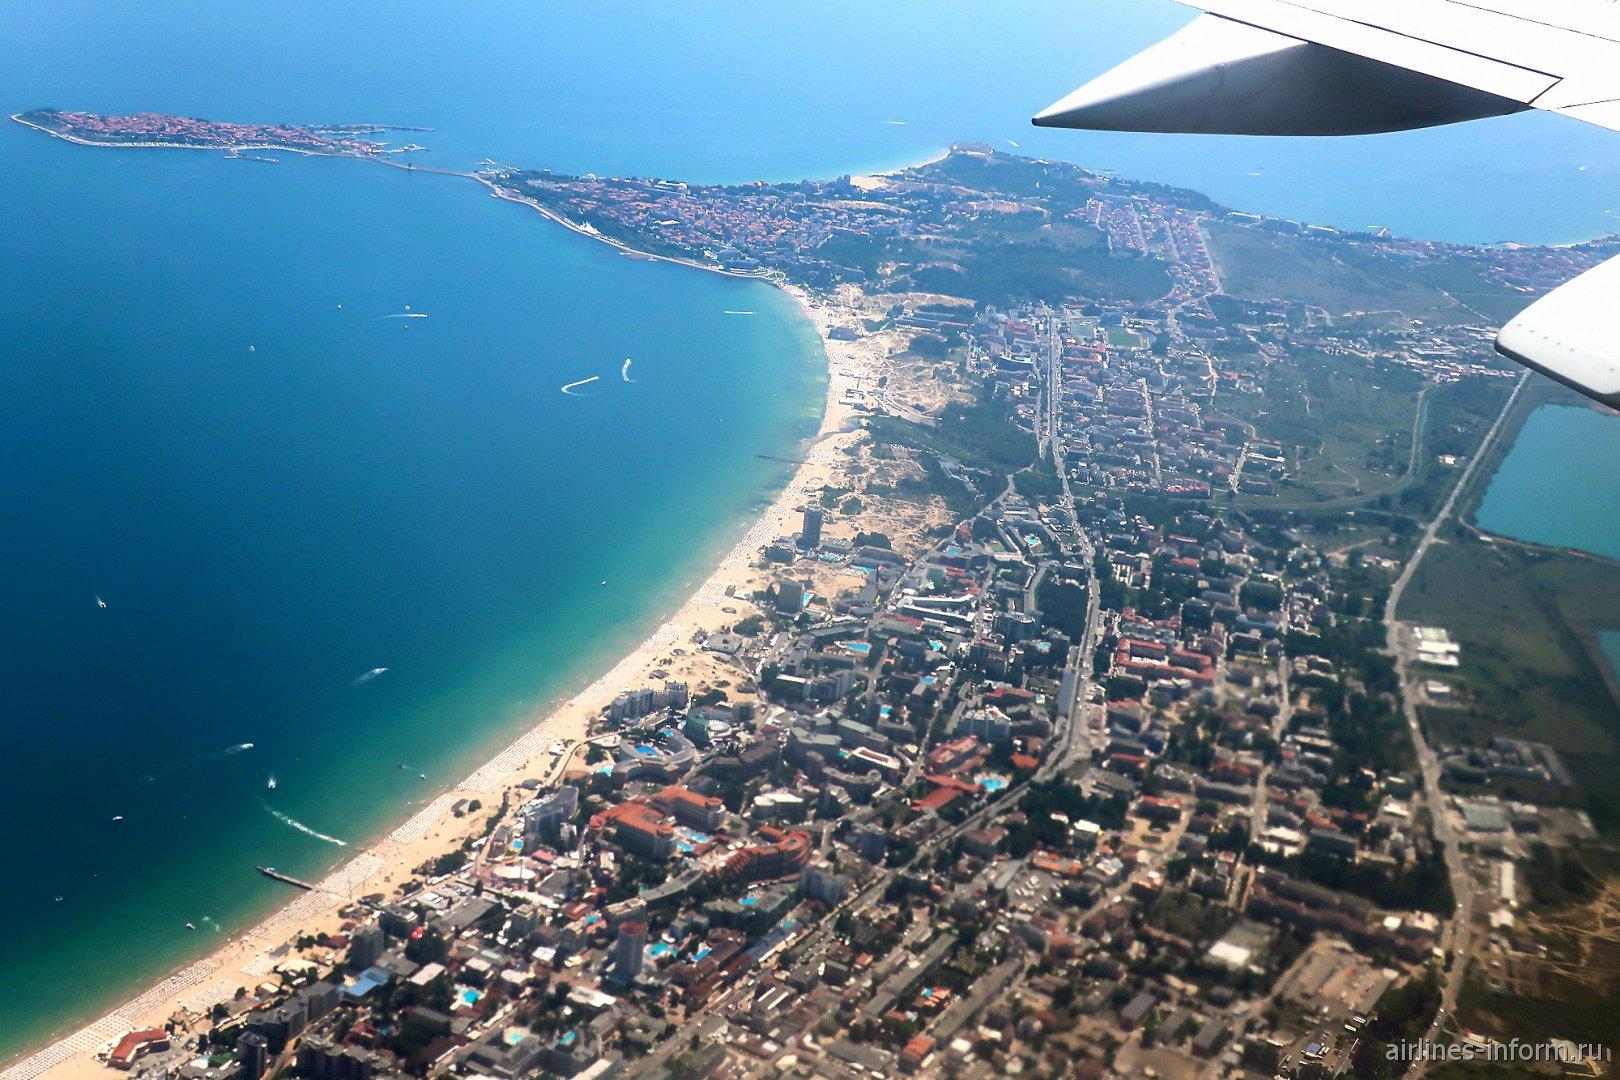 Курорт Солнечный Берег и город Несебр на черноморском побережье Болгарии